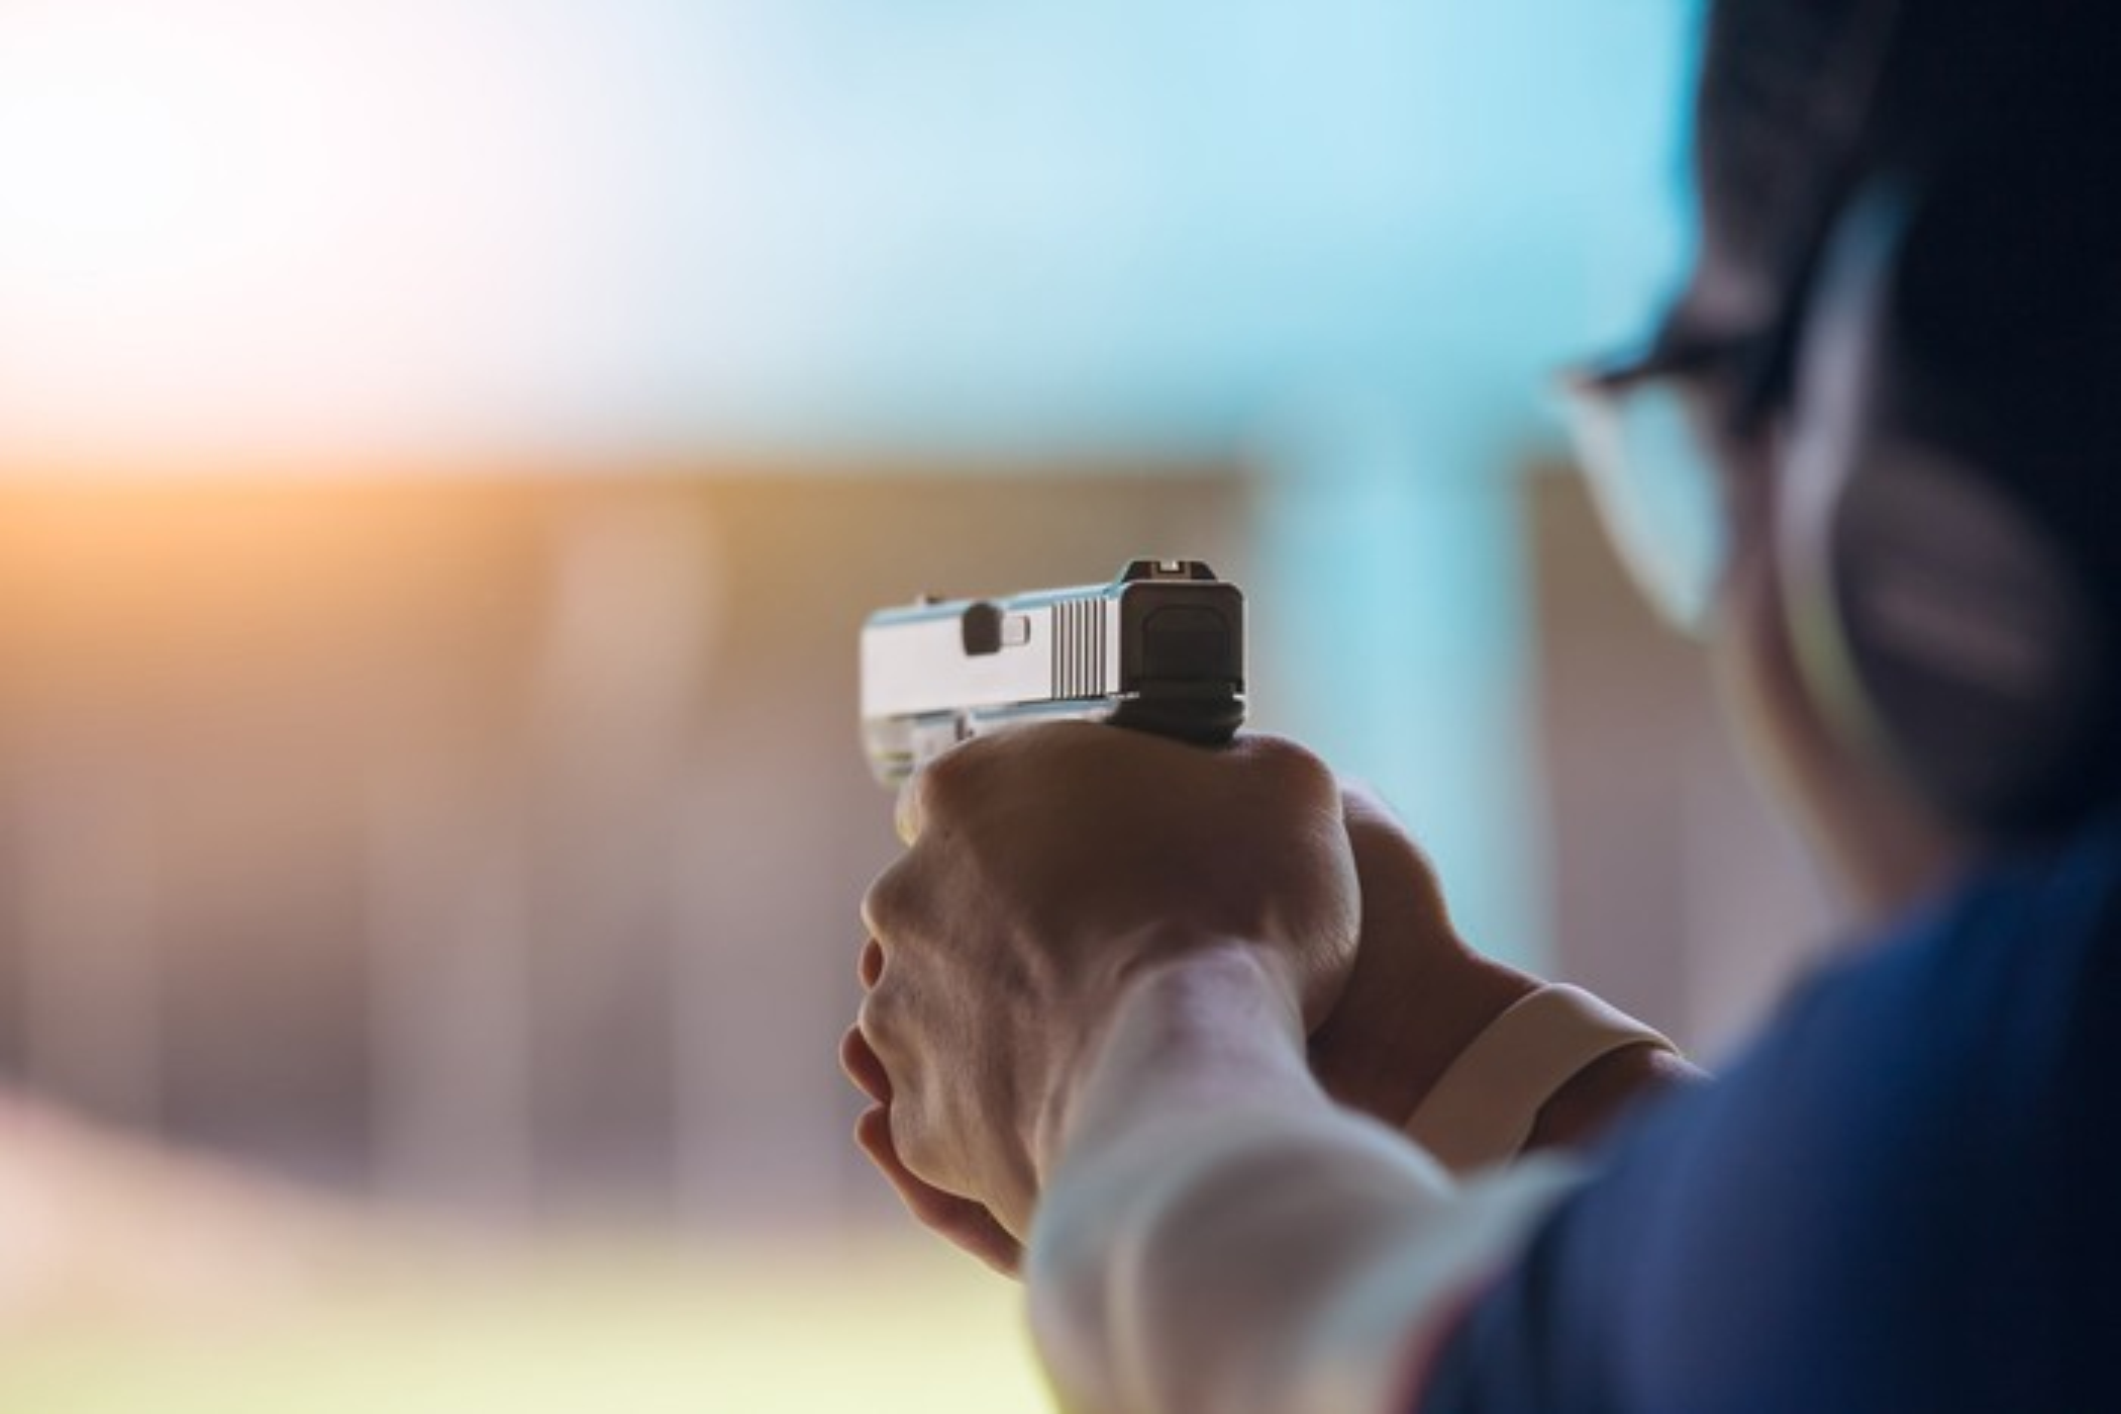 A person shooting a hand gun at a shooting range.